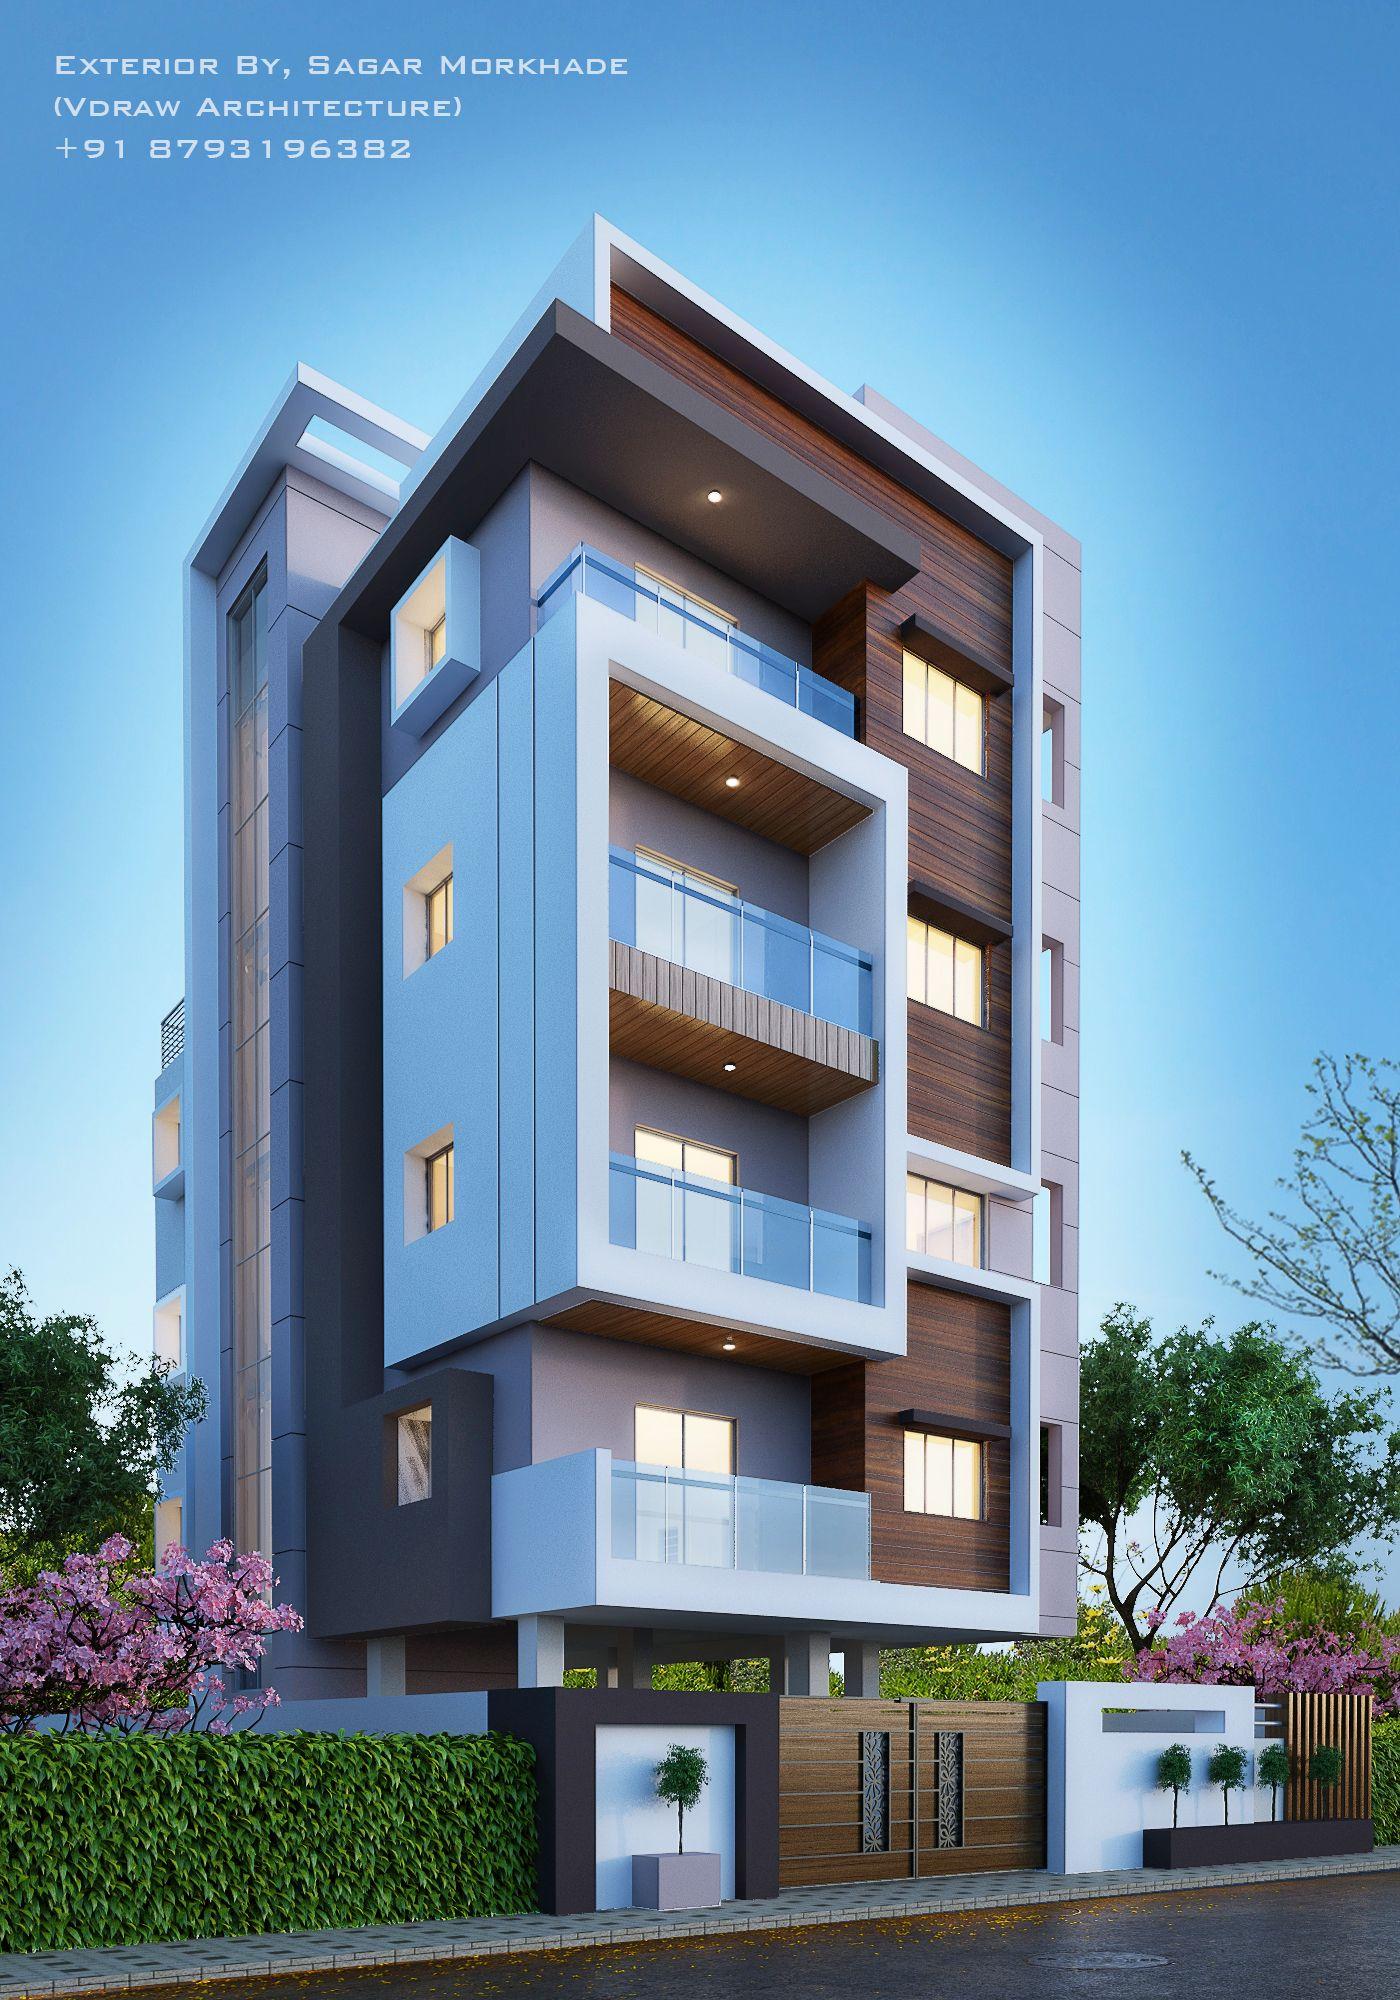 Exterior By Sagar Morkhade Vdraw Architecture 8793196382: Modern Residential Flat Scheme Exterior By, Sagar Morkhade (Vdraw Architecture) +91 8793196382